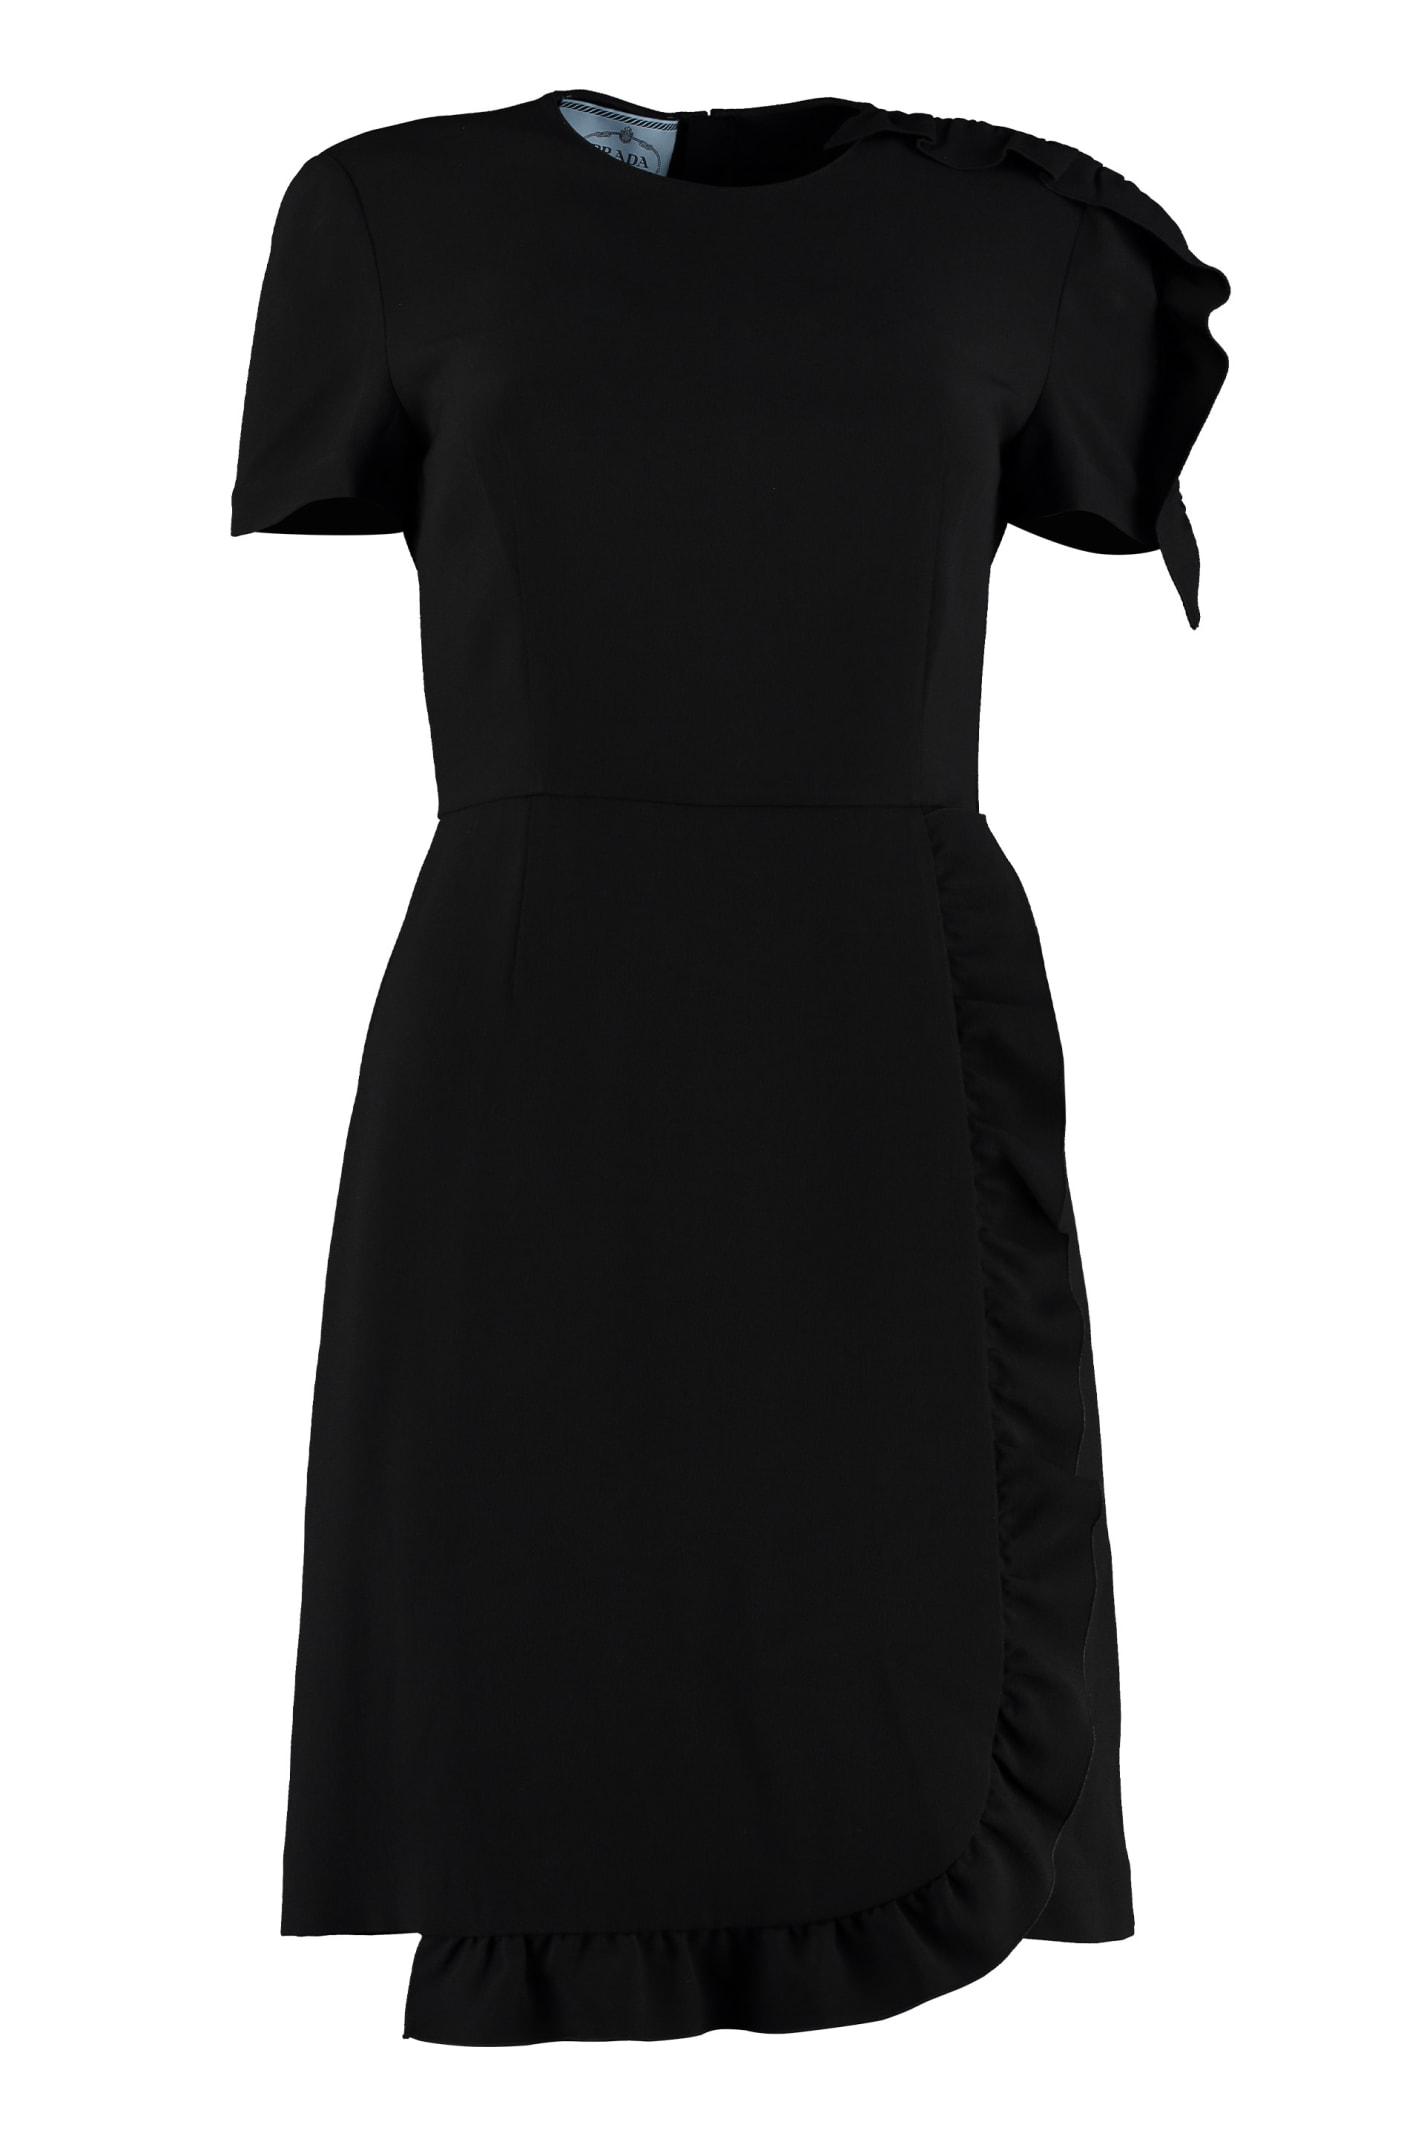 Buy Prada Ruffled Sheath Dress online, shop Prada with free shipping